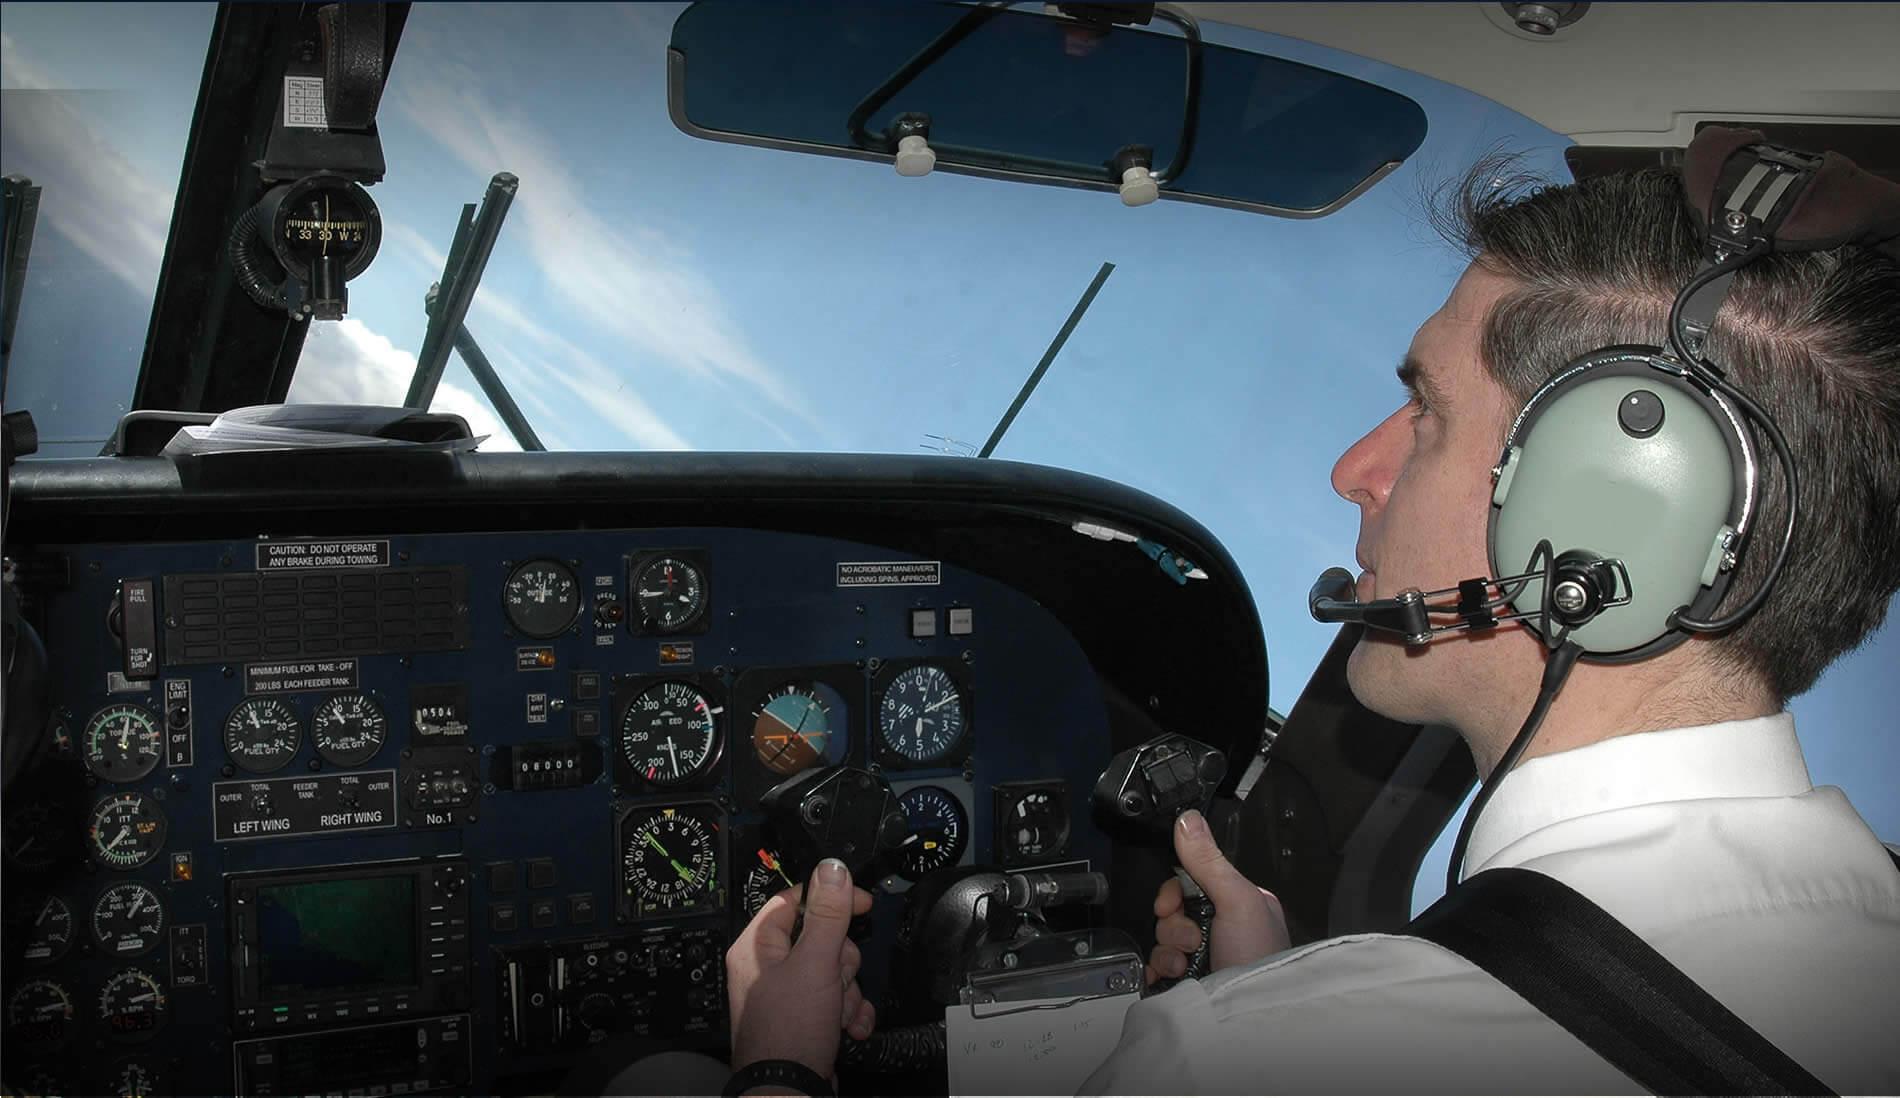 flugschule-austrian-pilots-academy-salzburg-14